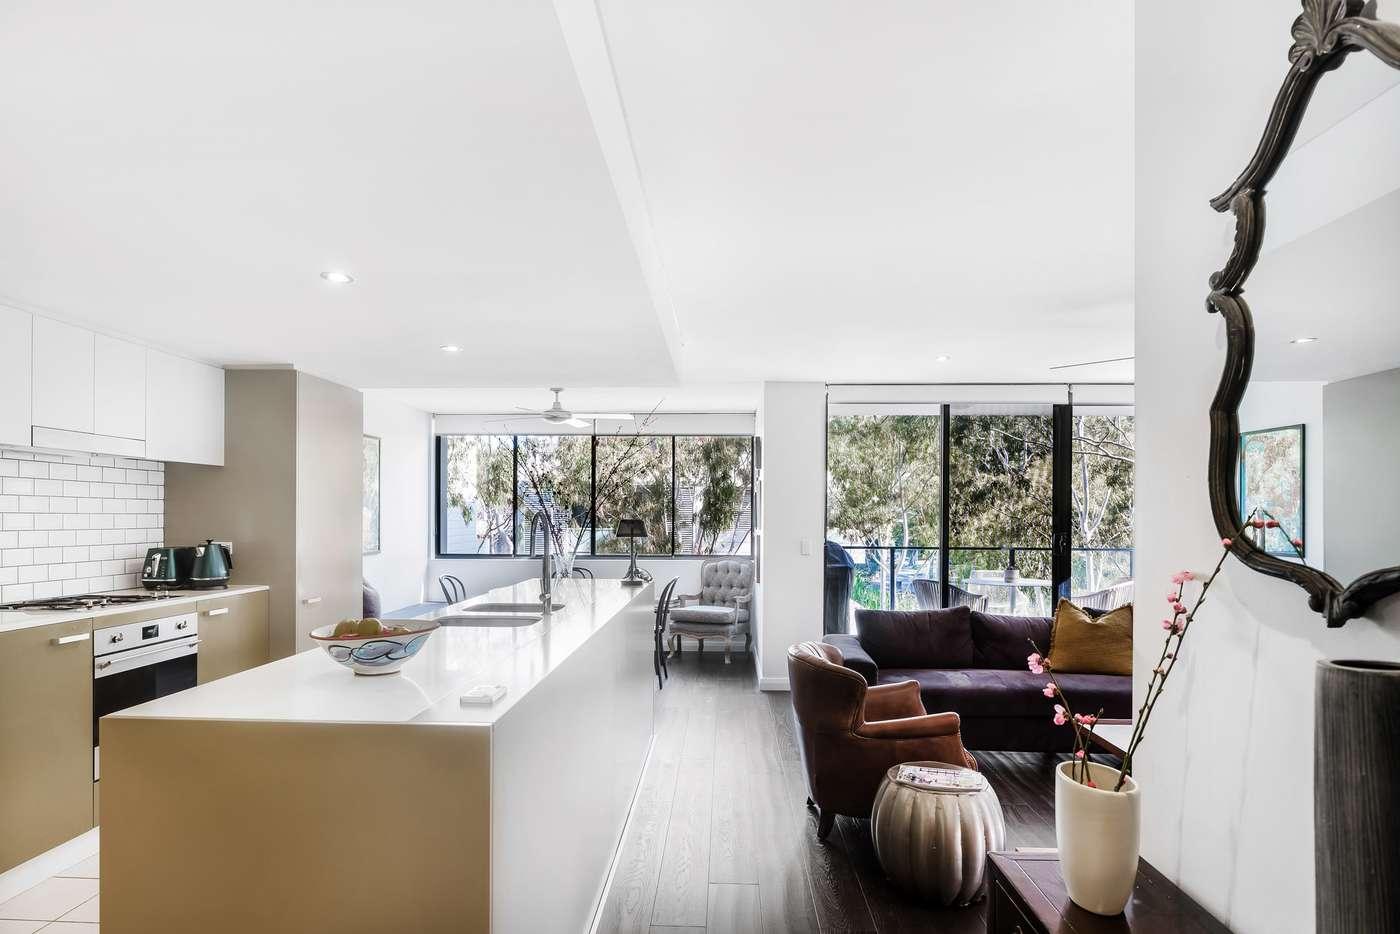 Main view of Homely apartment listing, 18/102 Joynton Avenue, Zetland NSW 2017